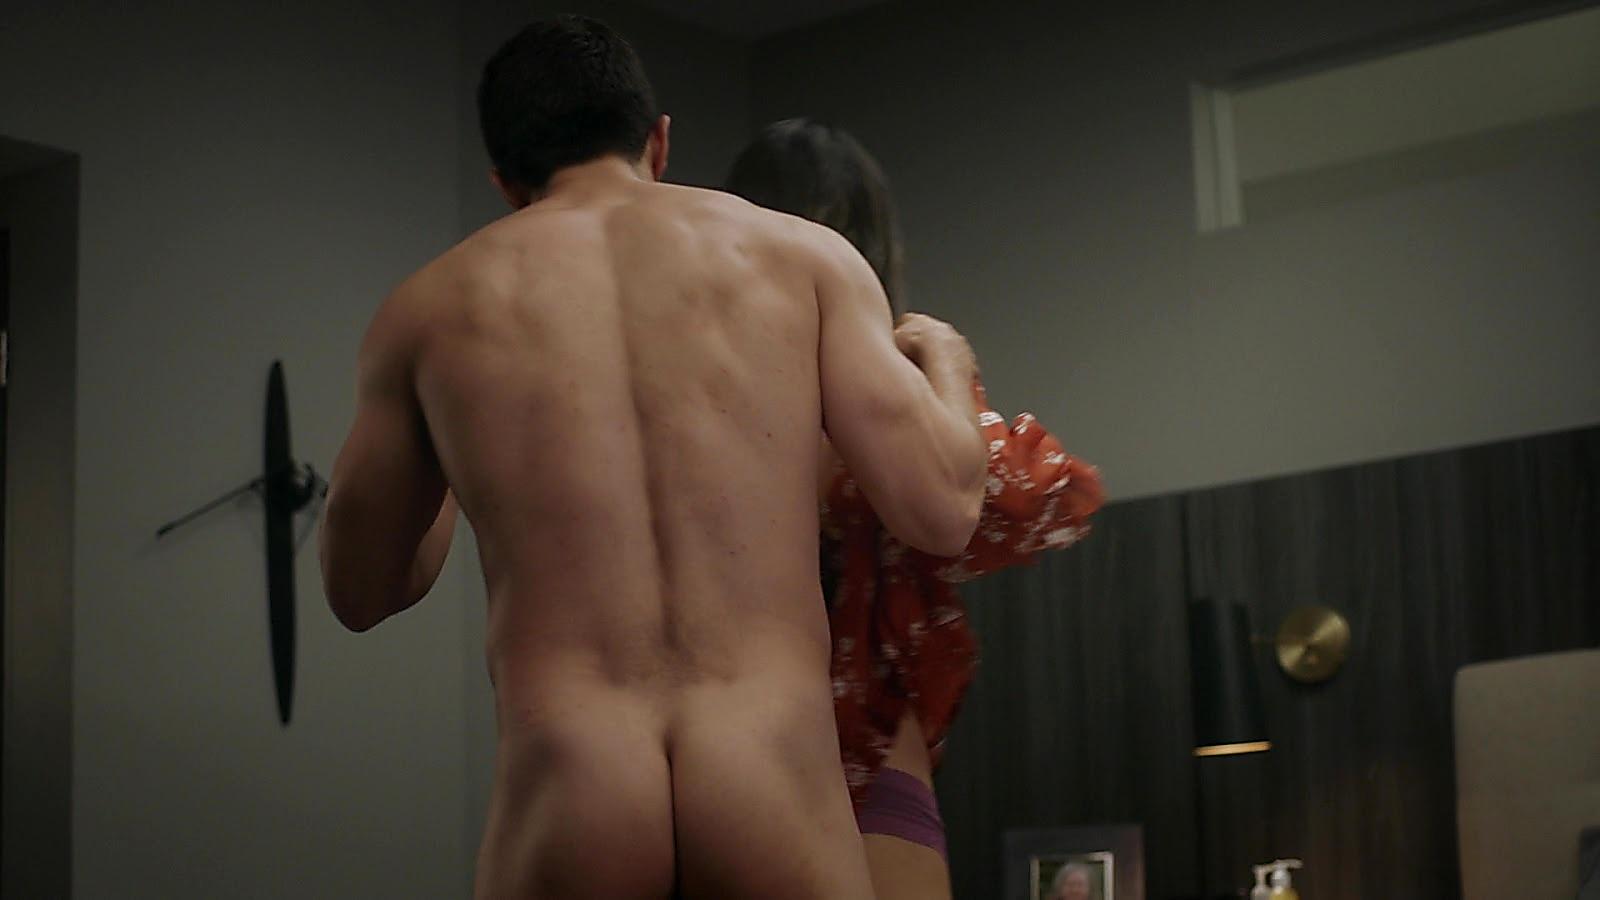 Adrian Gonzalez sexy shirtless scene June 2, 2020, 5am